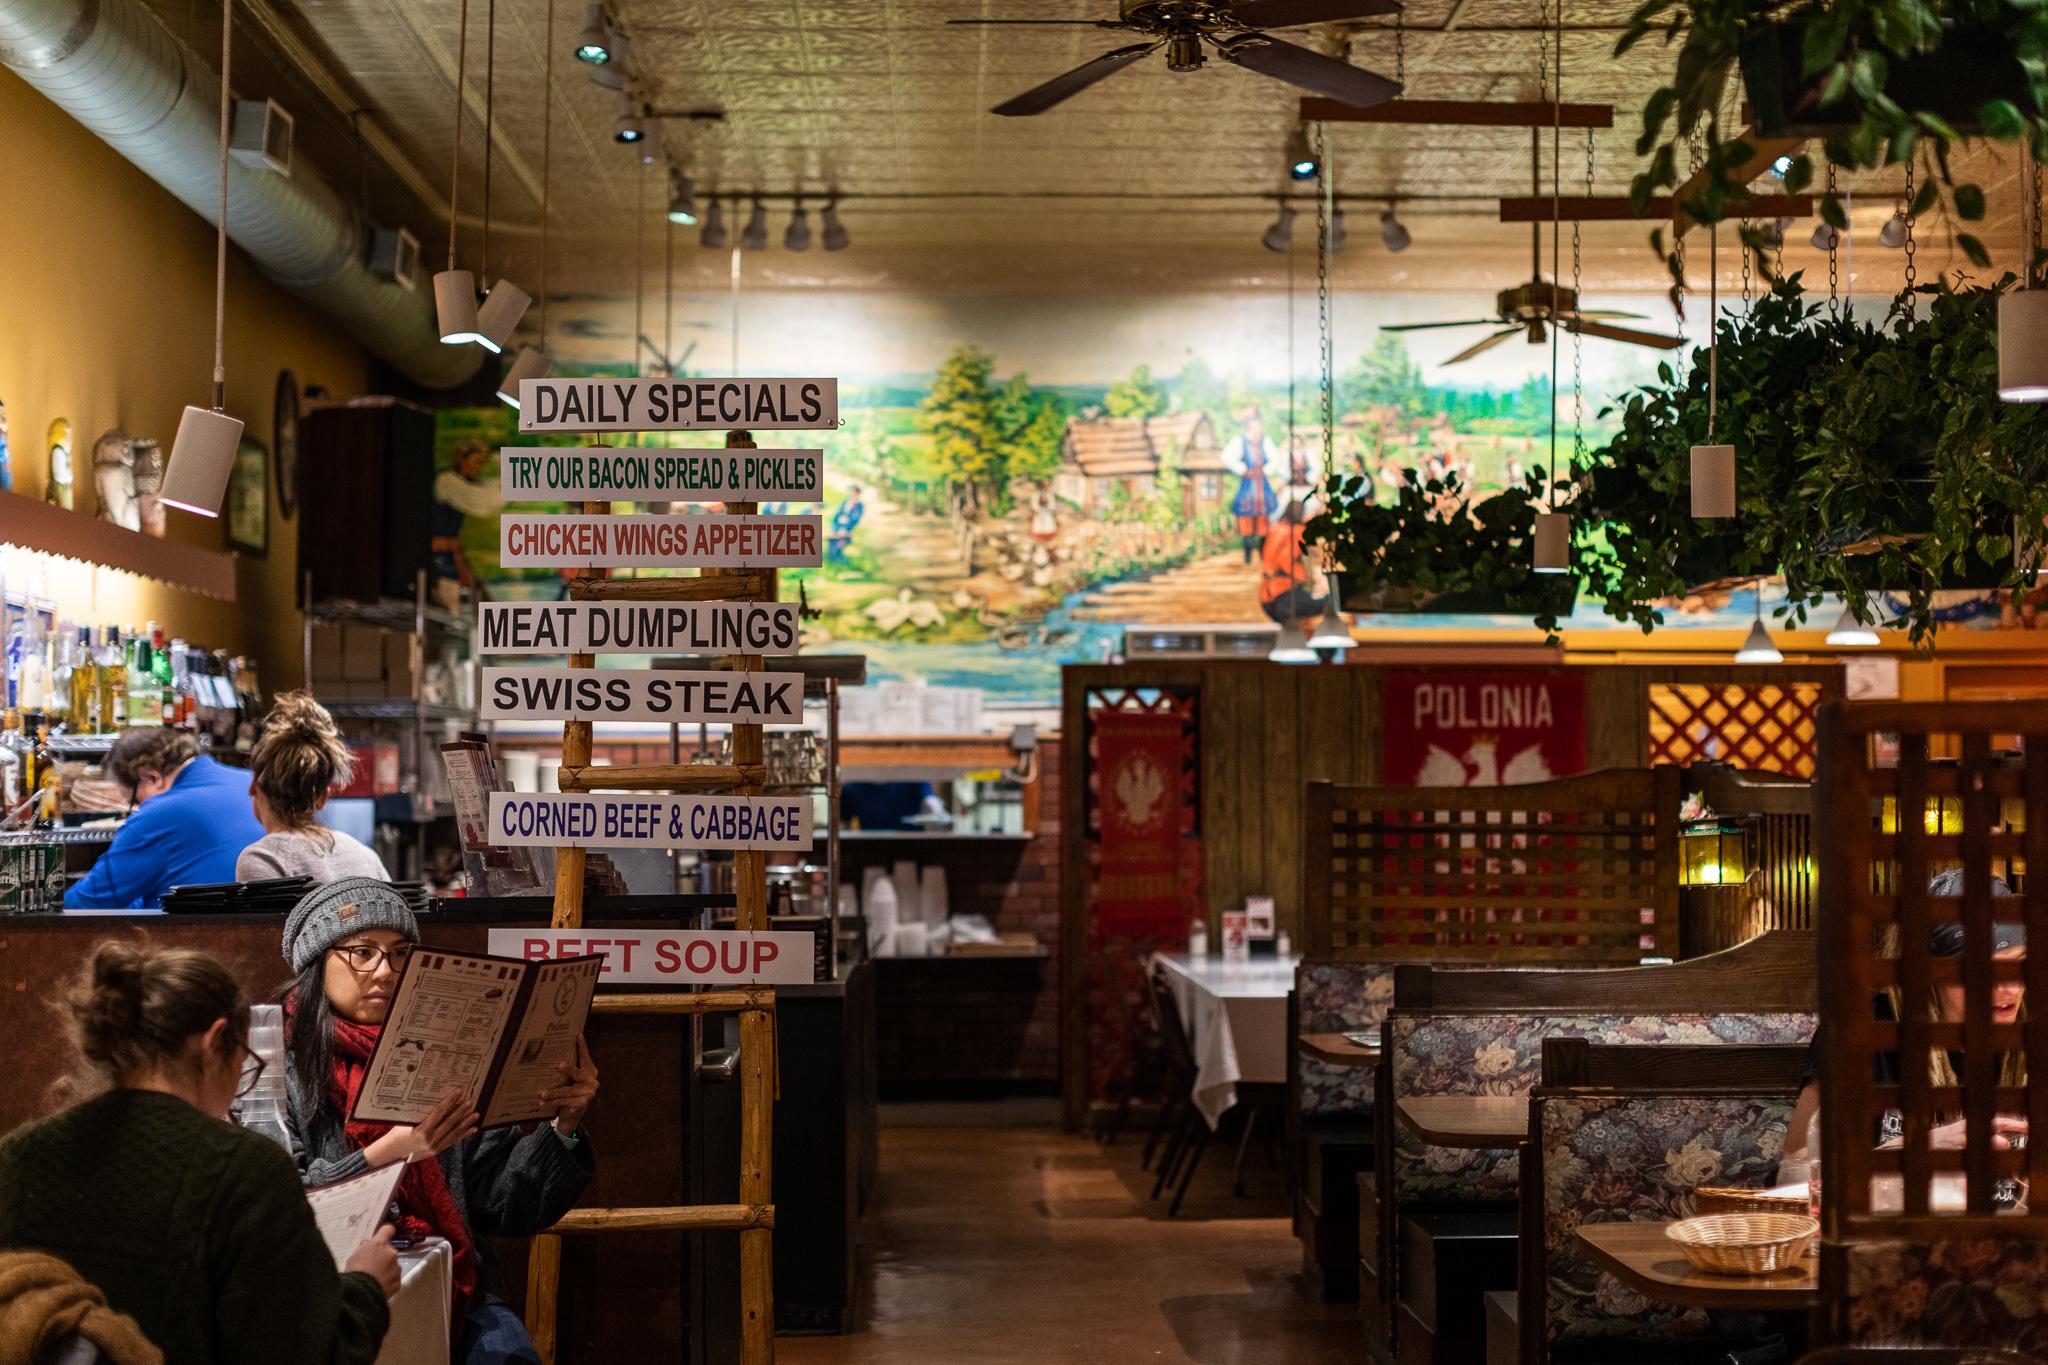 Customers look at menus inside Polonia restaurant.